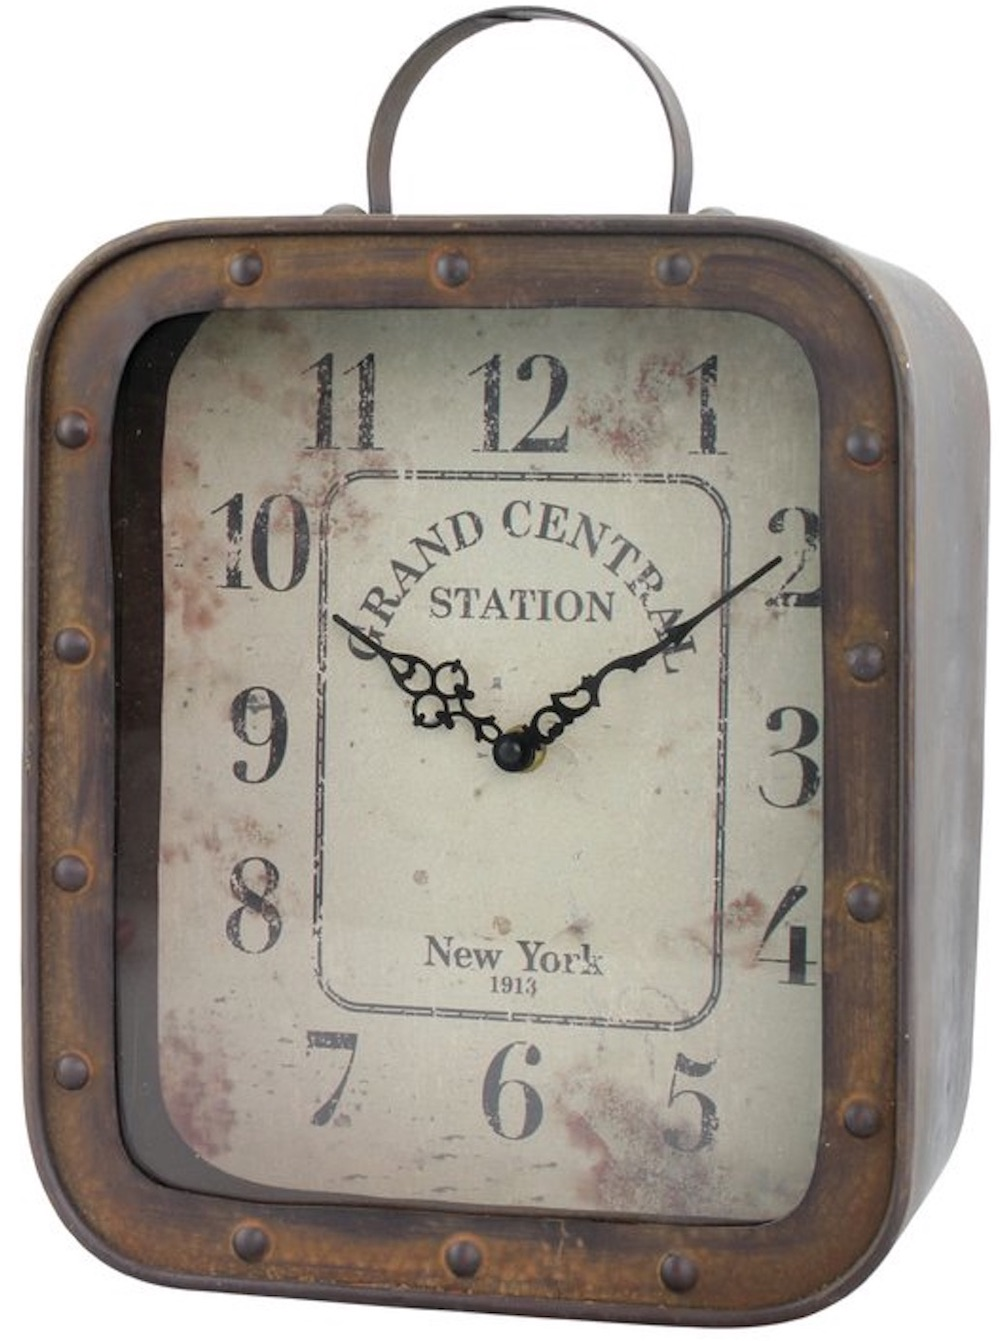 Clocks with Vintage Style Rustic Analog Table Clock #Clocks #MantleClocks #Timepiece #TableTopDecor #Decor